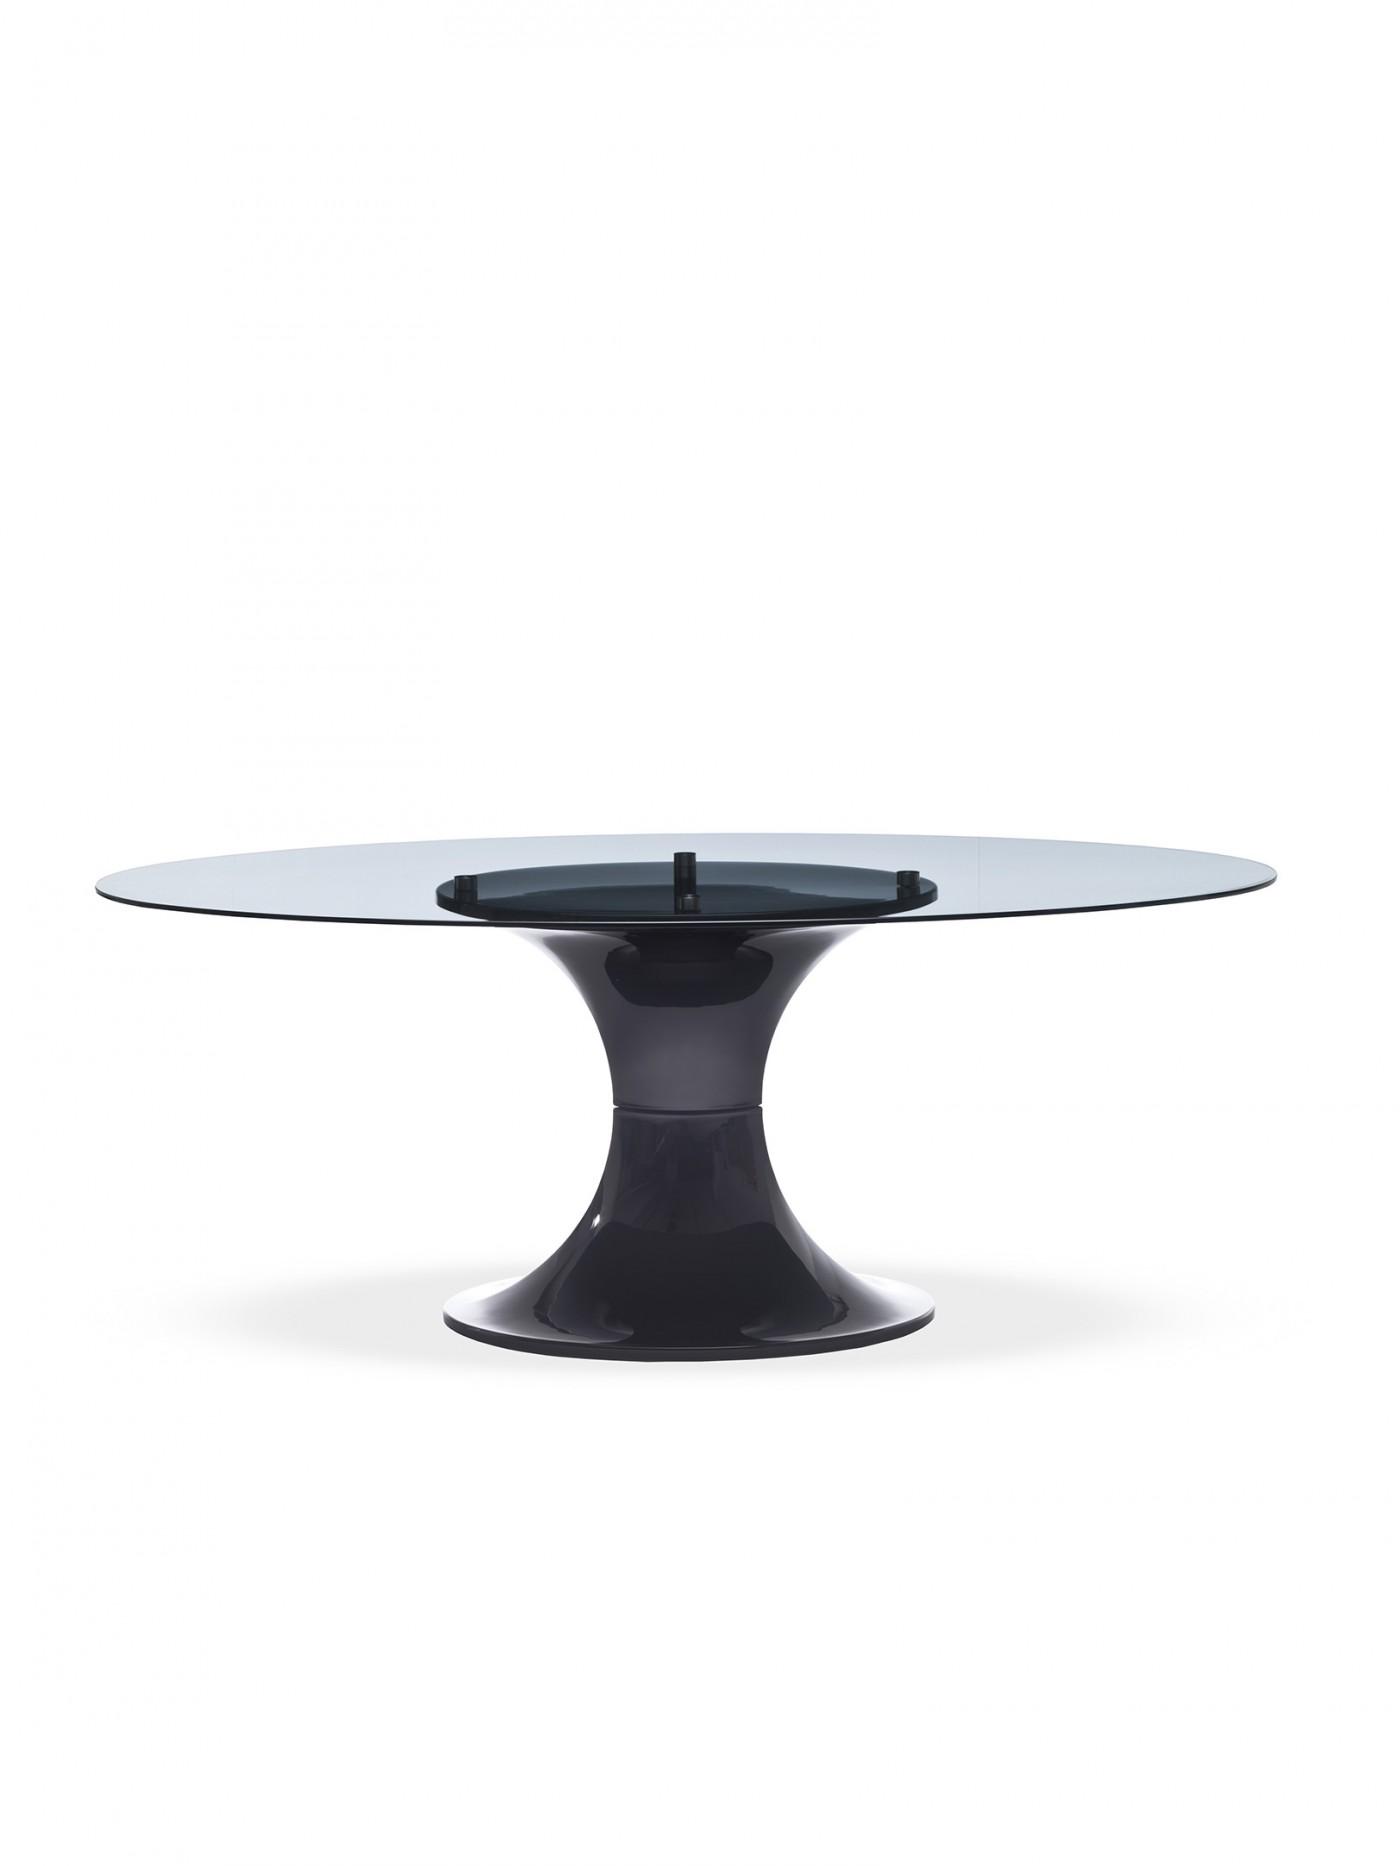 Tavolo london di midj ovale - Tavolo vetro ovale ...